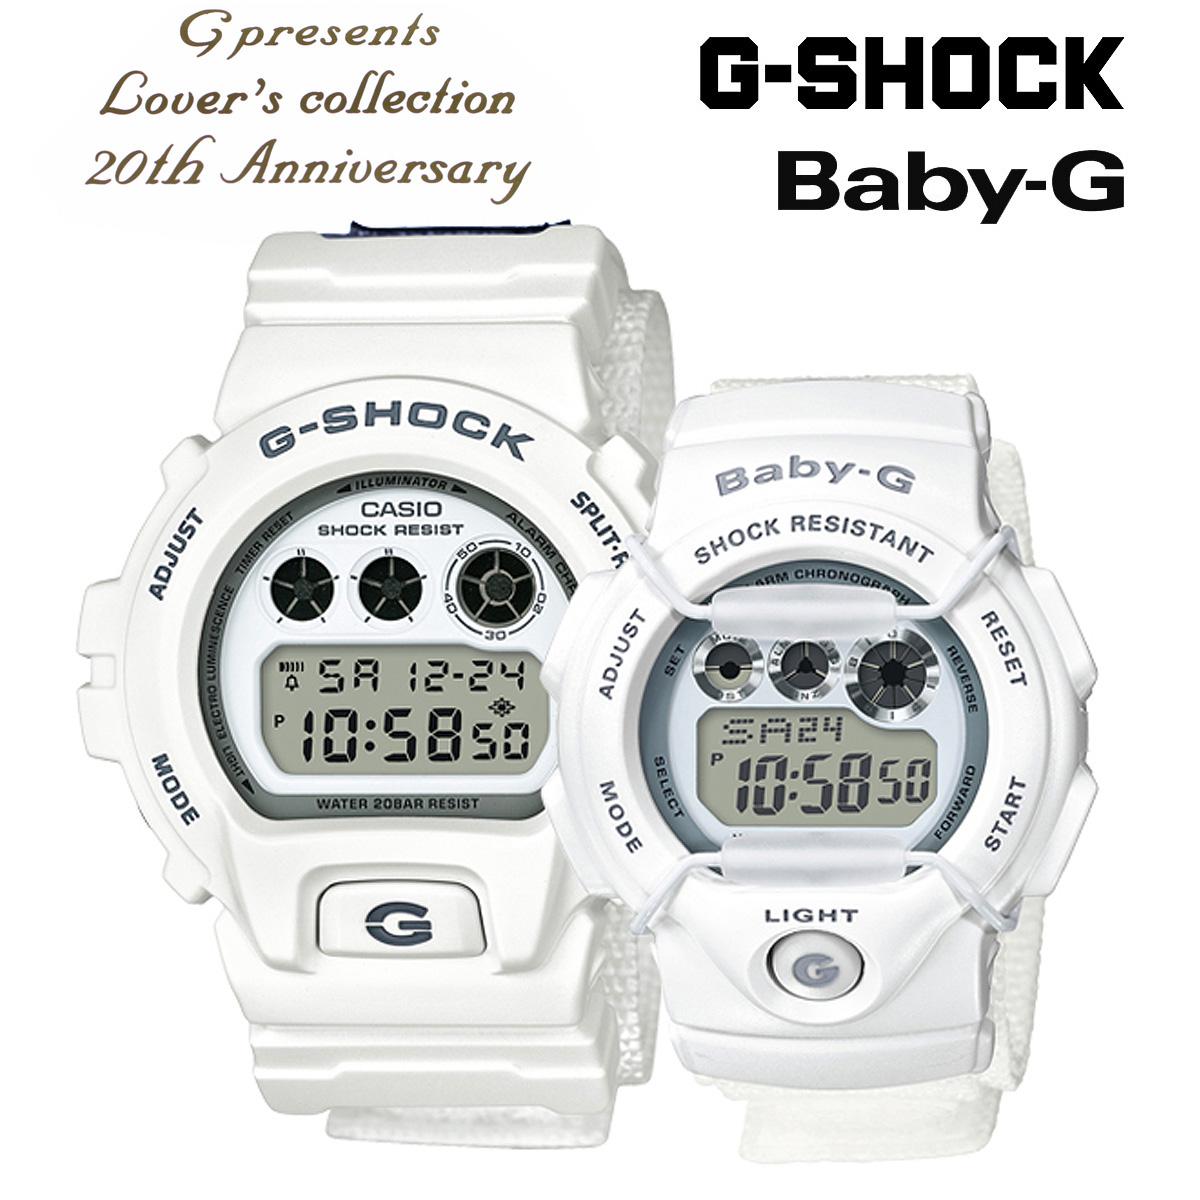 07965448542 CASIO watch G shock CASIO g-shock men s women s baby-g LOV-16C-7JR G  PRESENTS LOVER s COLLECTION 2016 palocci  11 18 new in stock